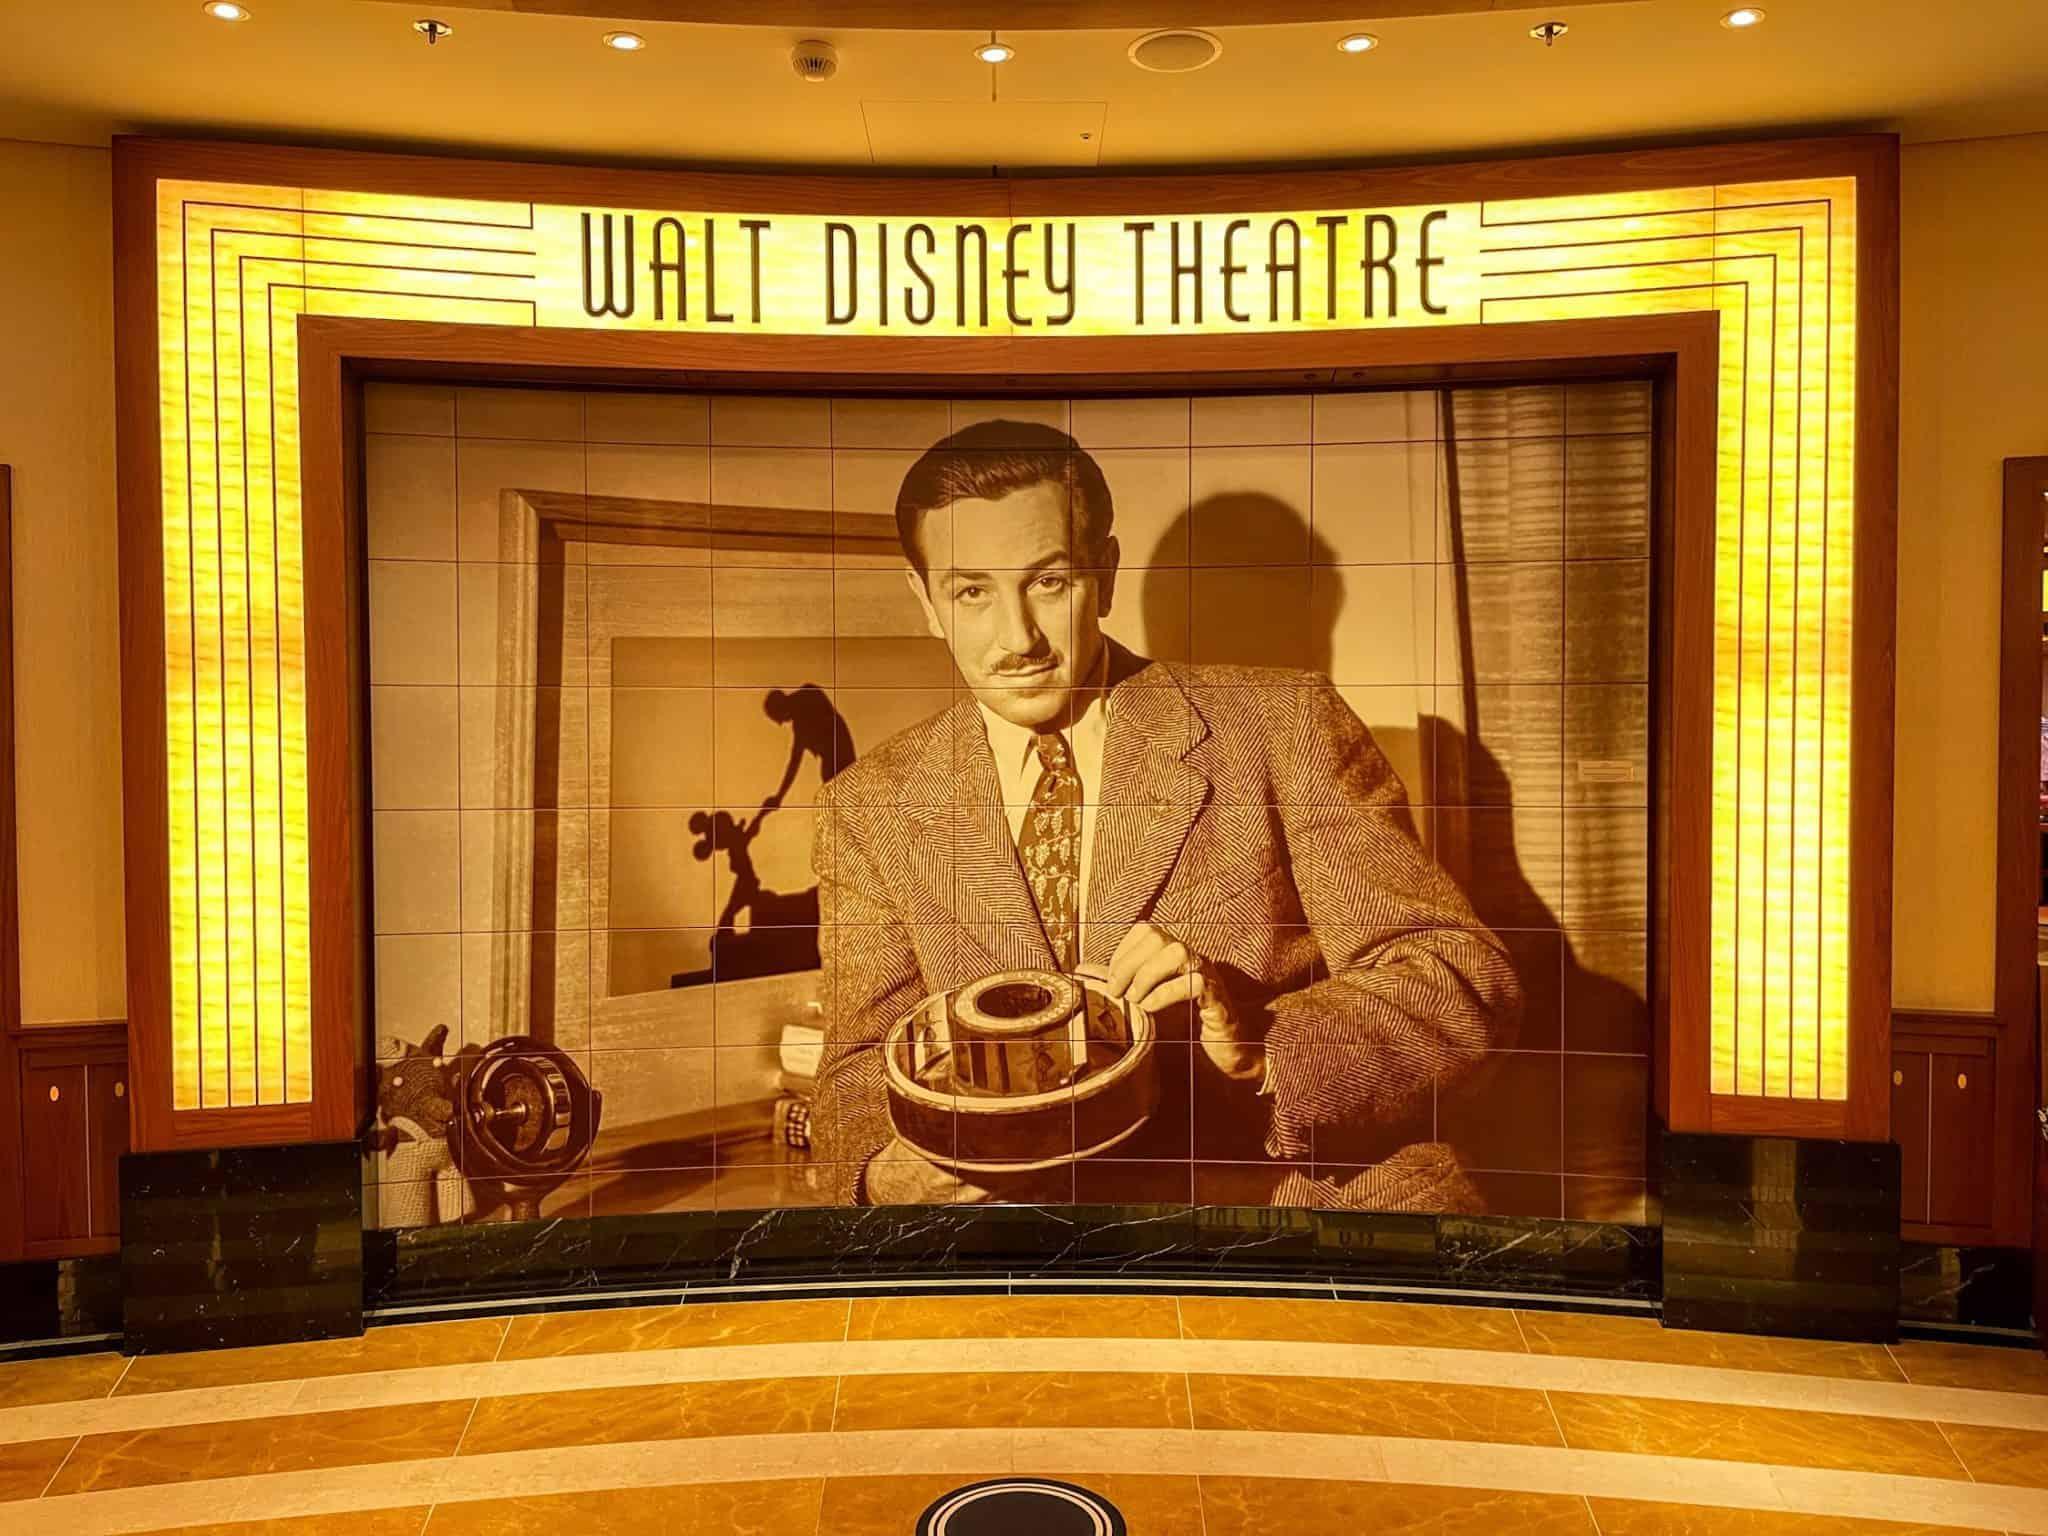 walt disney theatre disney fantasy